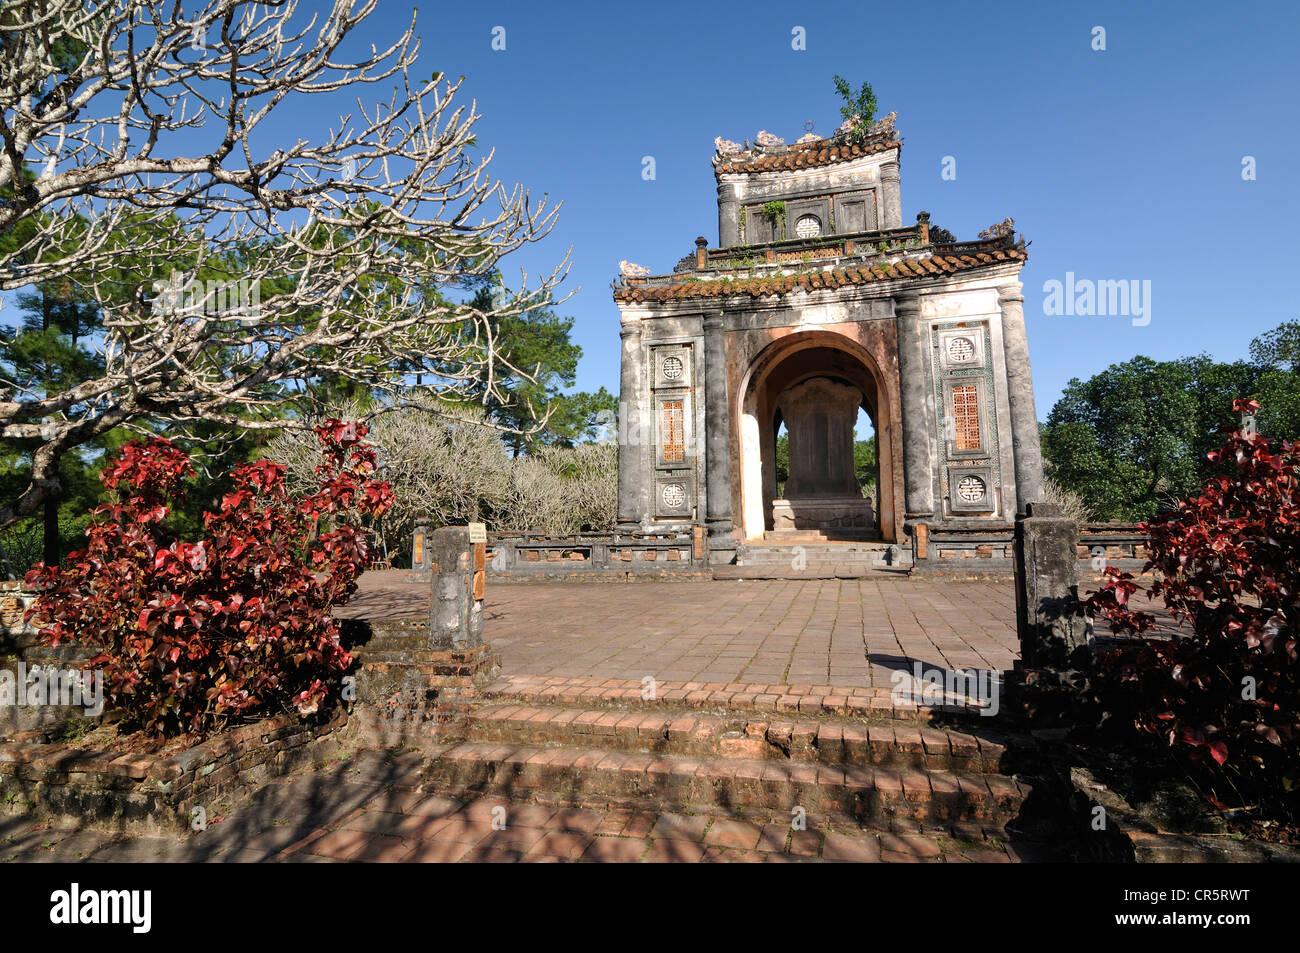 Emperor Tu Duc Mausoleum, Hue, North Vietnam, Vietnam, Southeast Asia, Asia - Stock Image